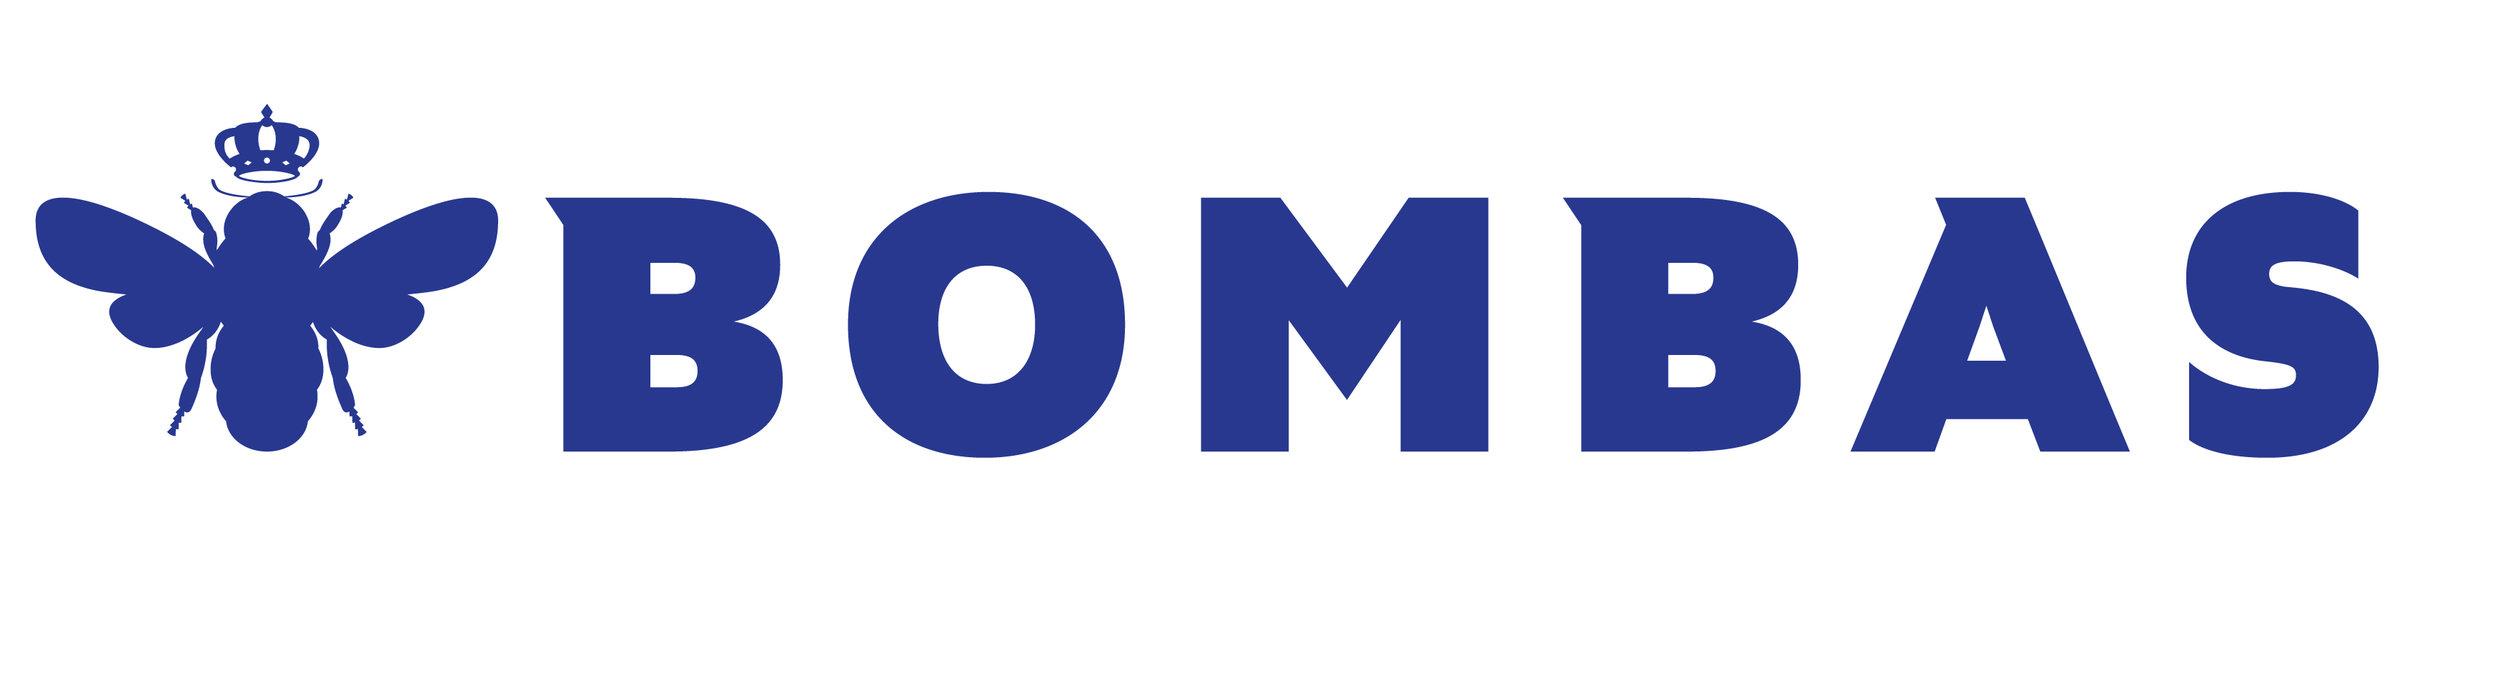 Bombas_Logo_Left_Blue copy.jpg